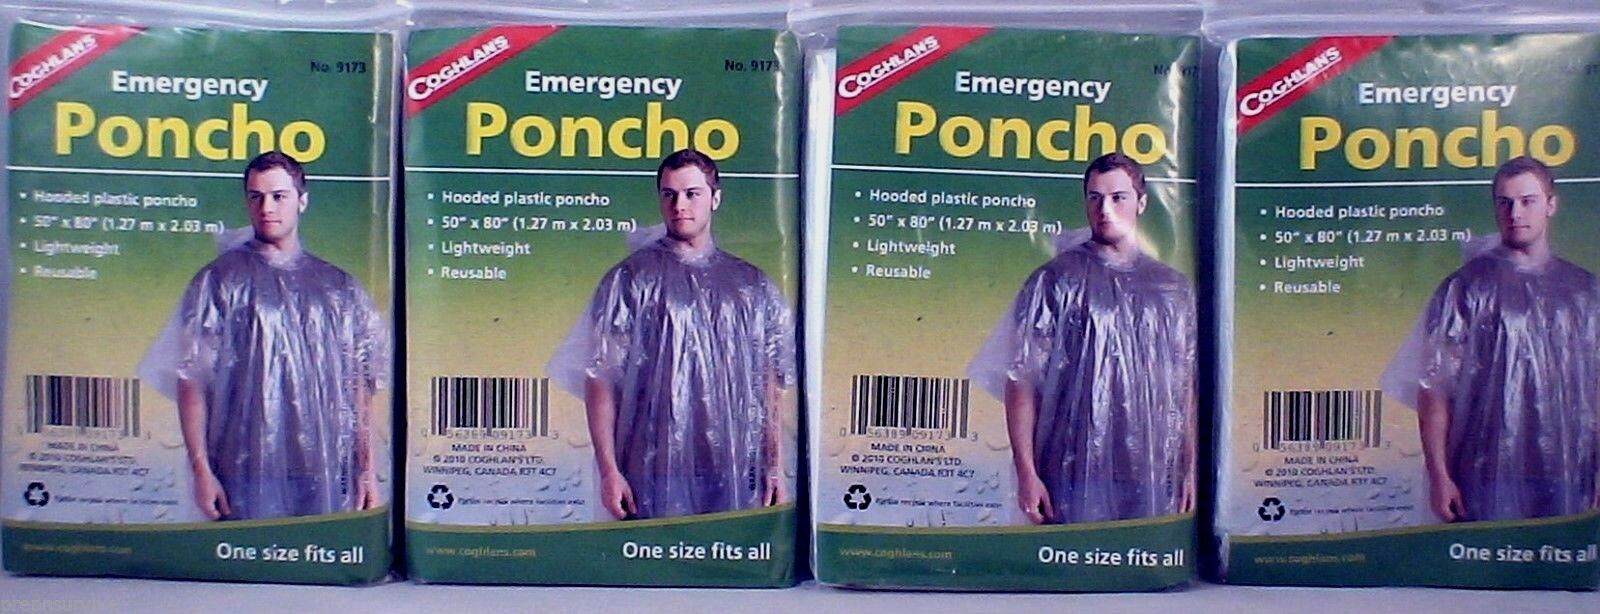 Coghlan/'s 9173 Urgence Poncho Pack de 2